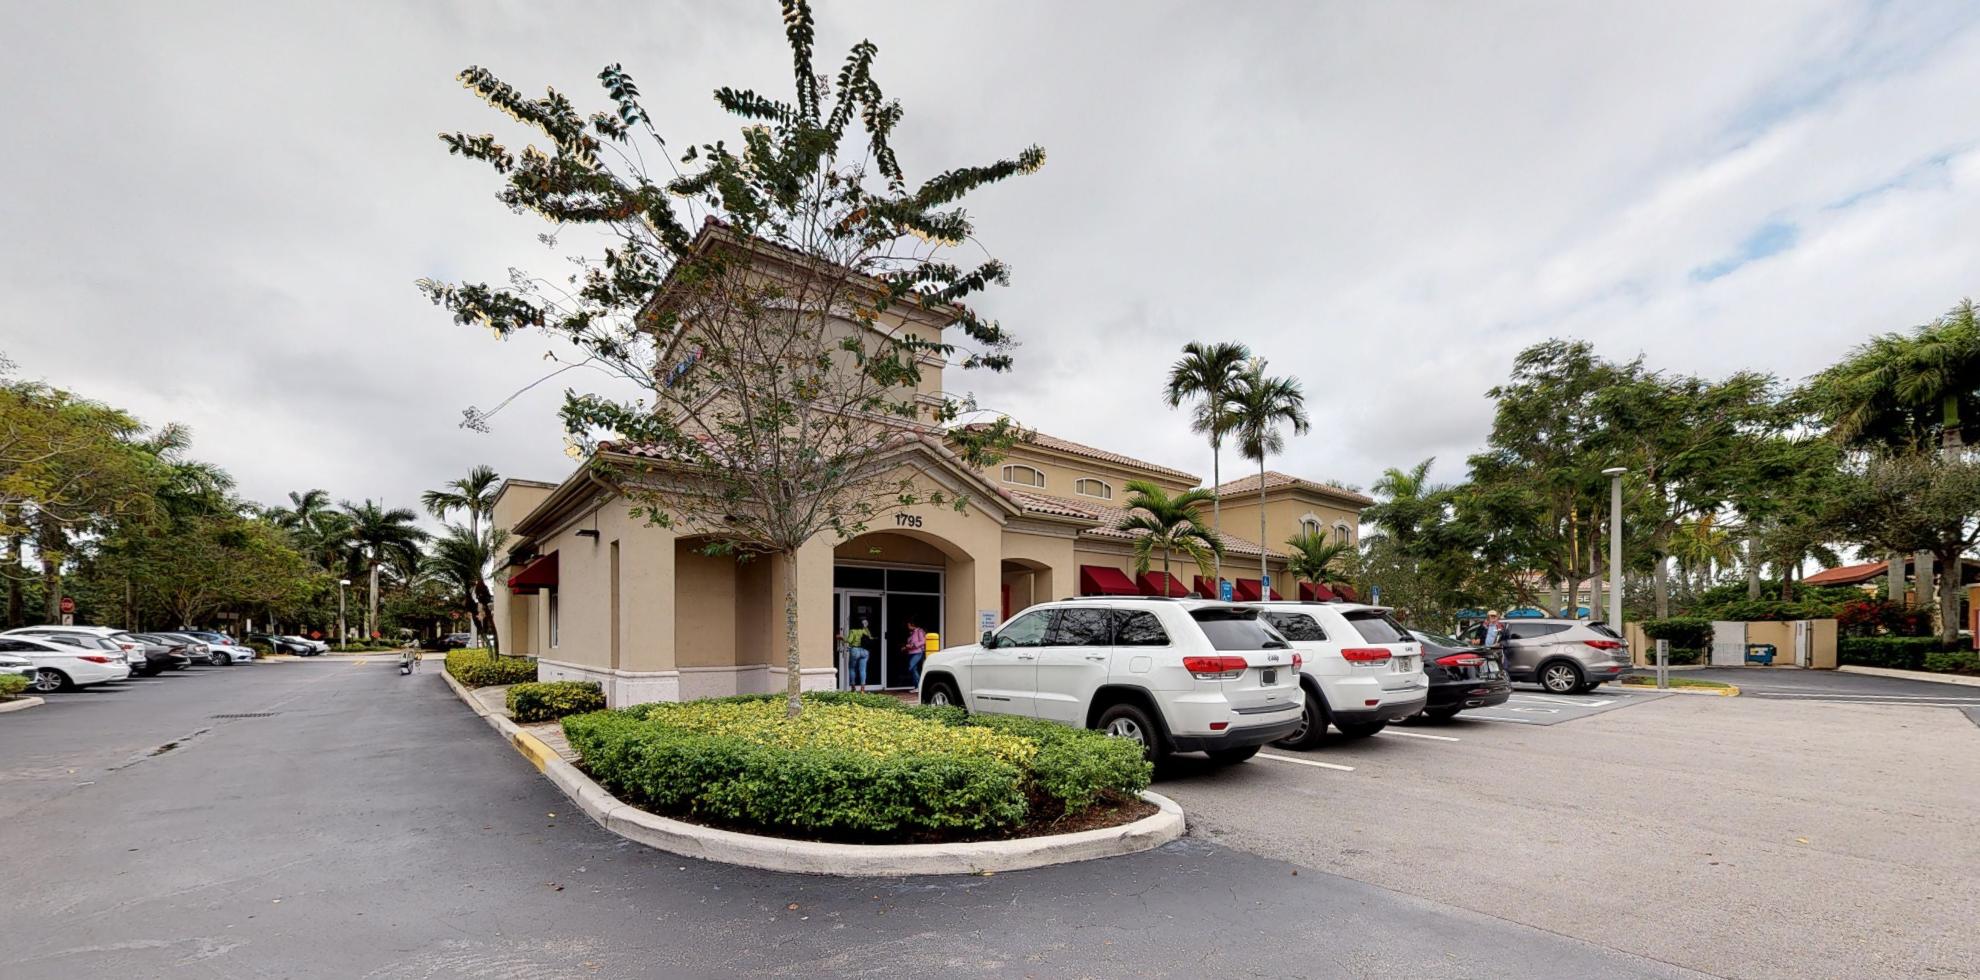 Bank of America financial center with drive-thru ATM   1795 Bonaventure Blvd, Weston, FL 33326